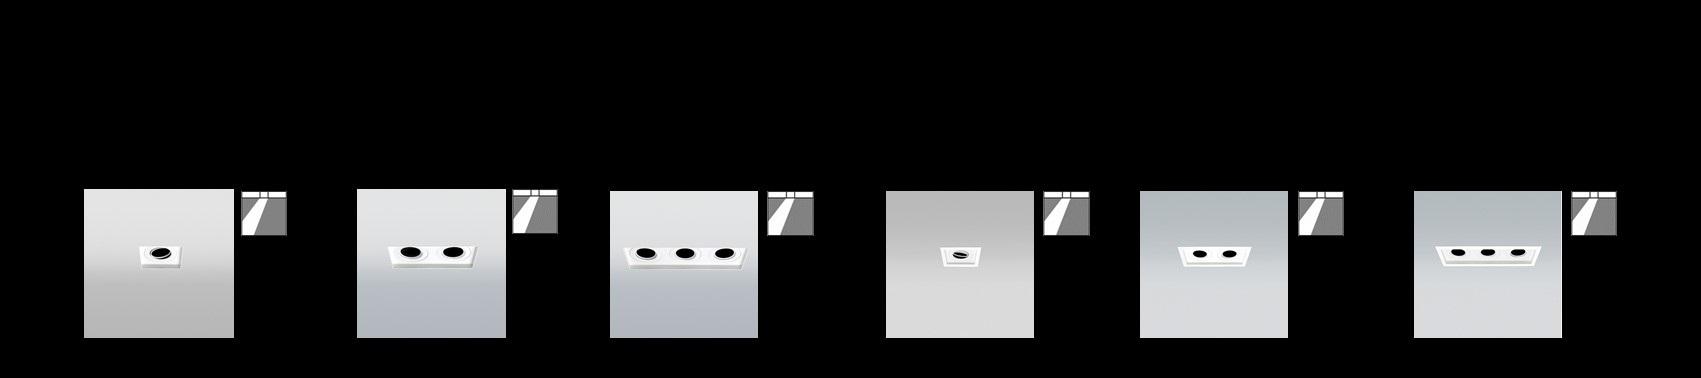 16.afb-header-lucent-lighting-focus-multiple-zwart-website